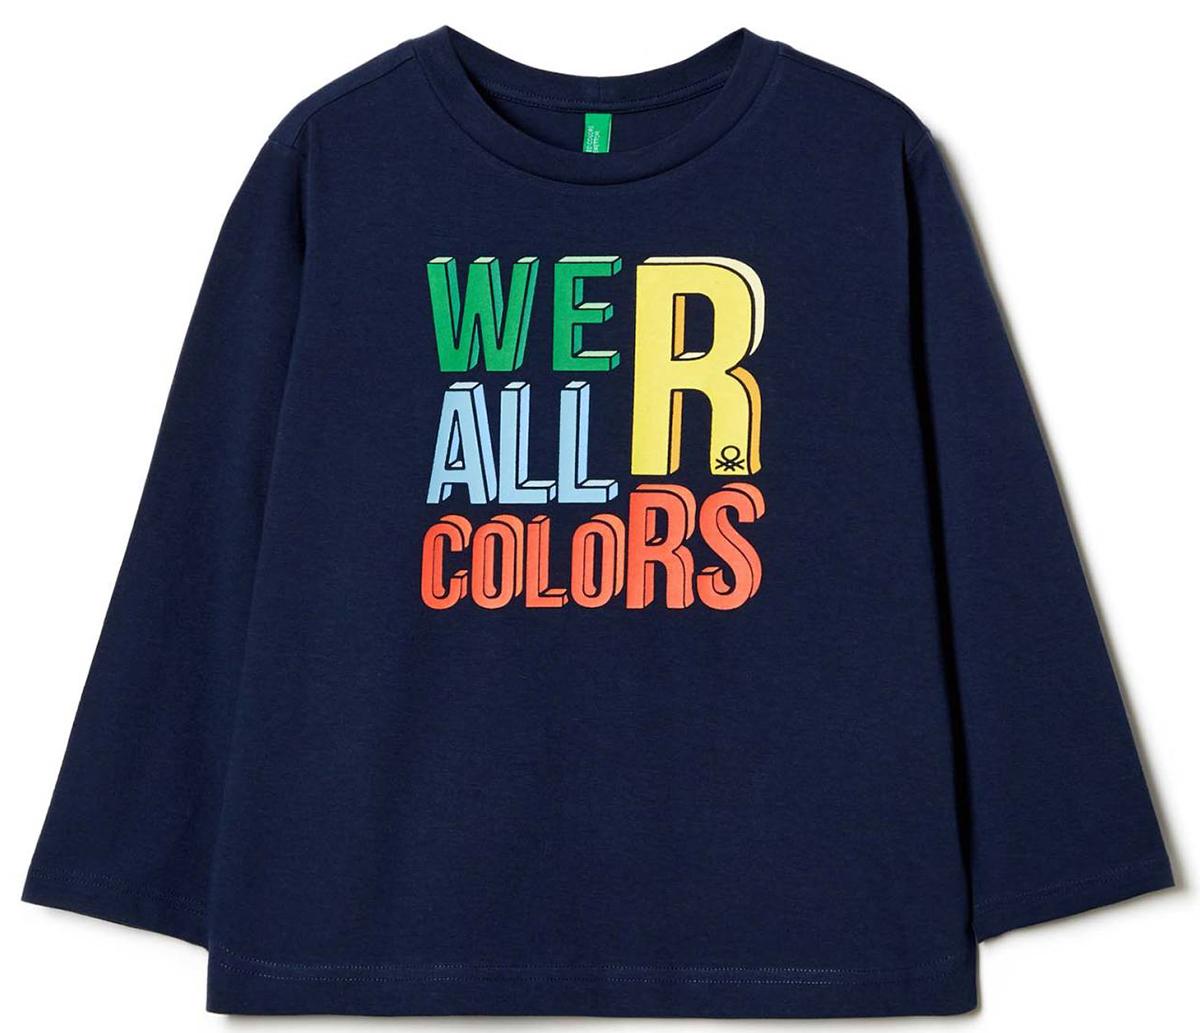 Майка для мальчиков United Colors of Benetton, цвет: синий. 3I1XC1389_13C. Размер 1303I1XC1389_13C